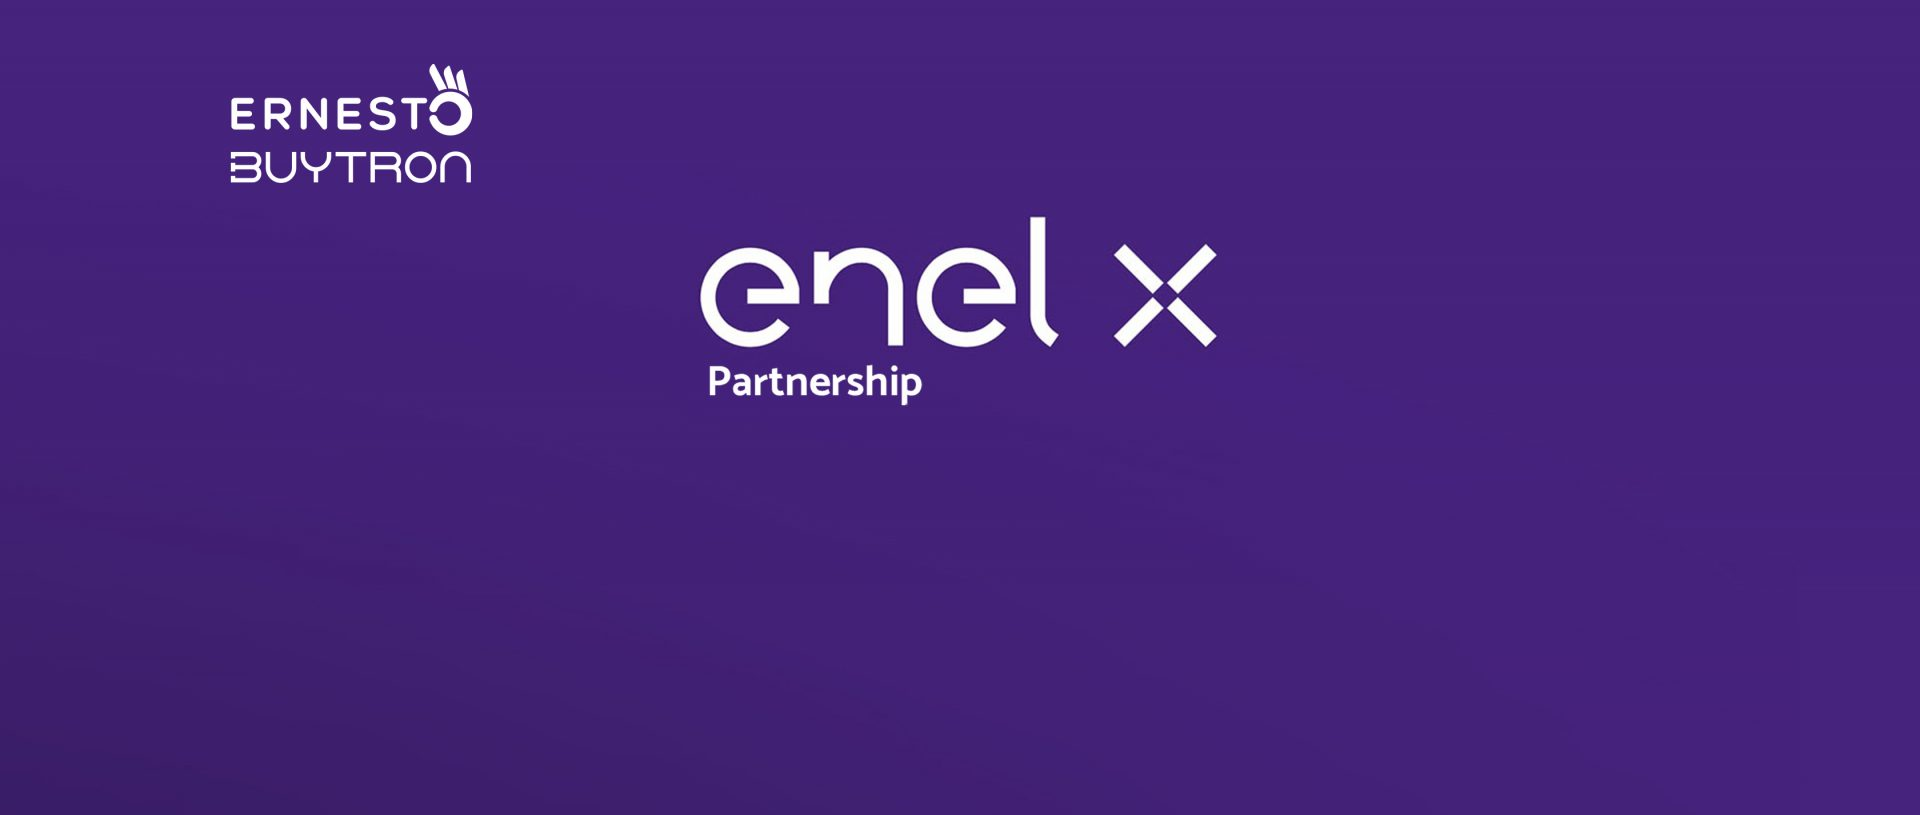 Partnership tra Enel X ed Ernesto